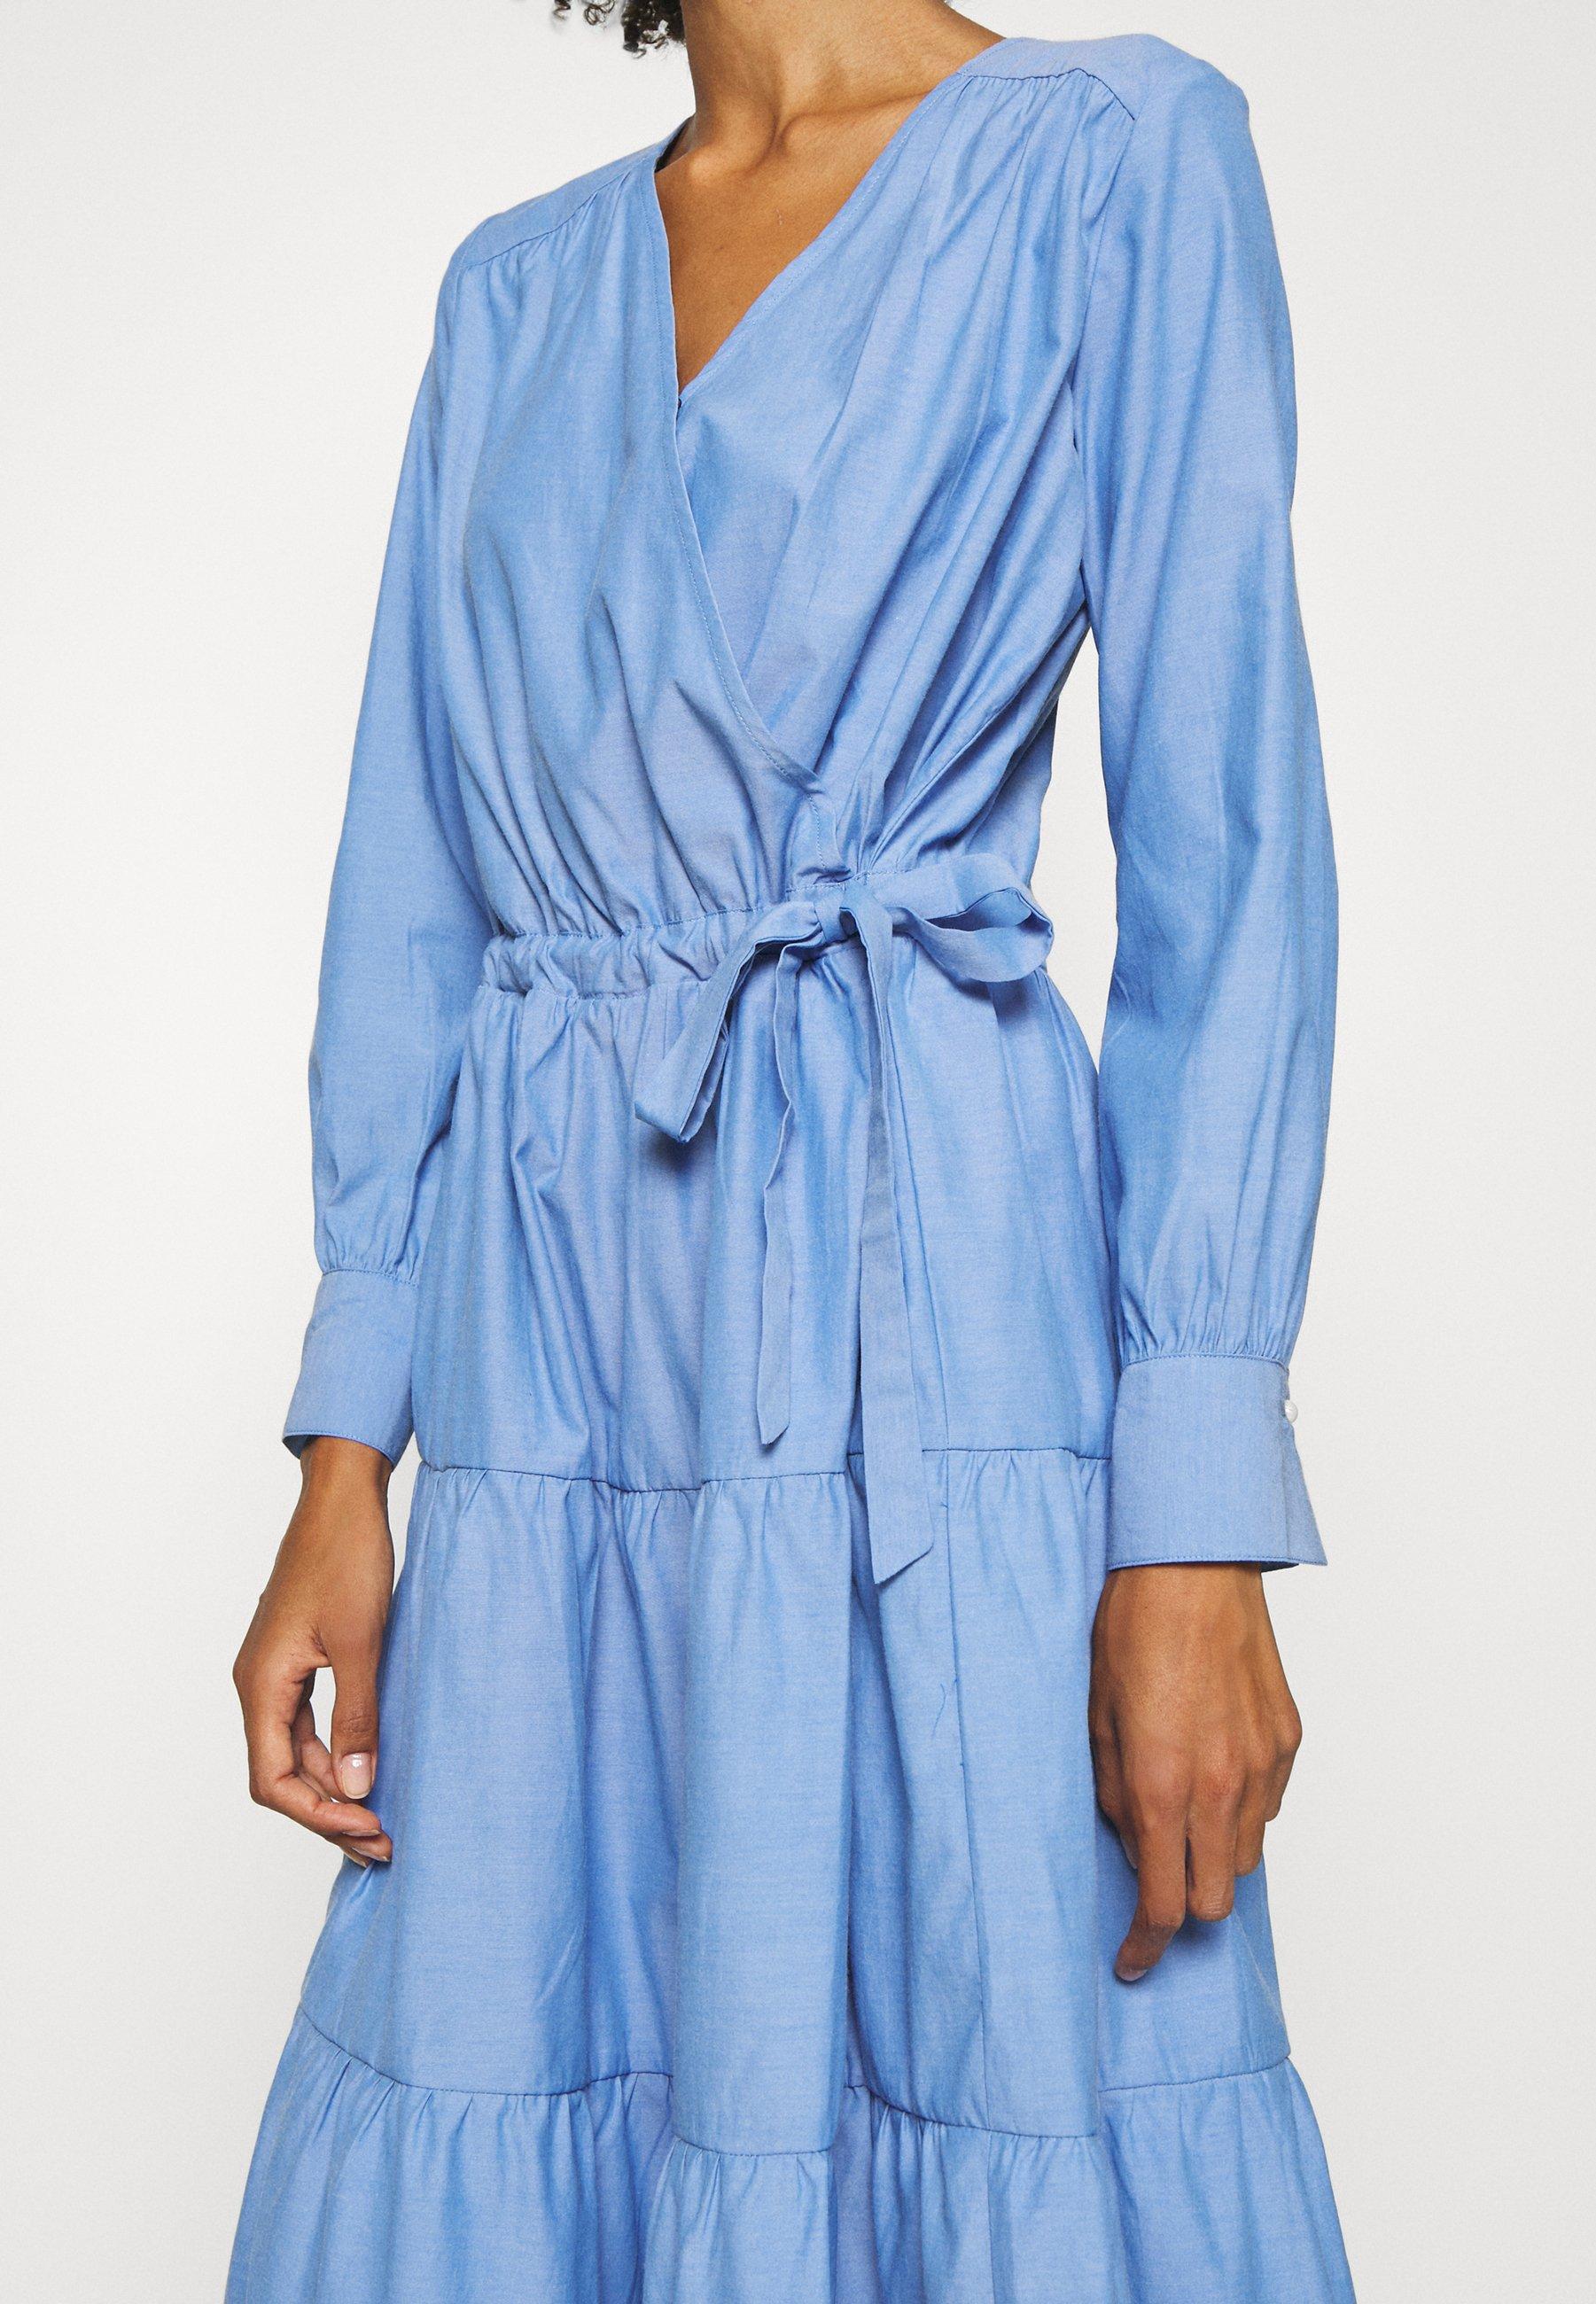 Blue Marley dress  Six Ames  Hverdagskjoler - Dameklær er billig